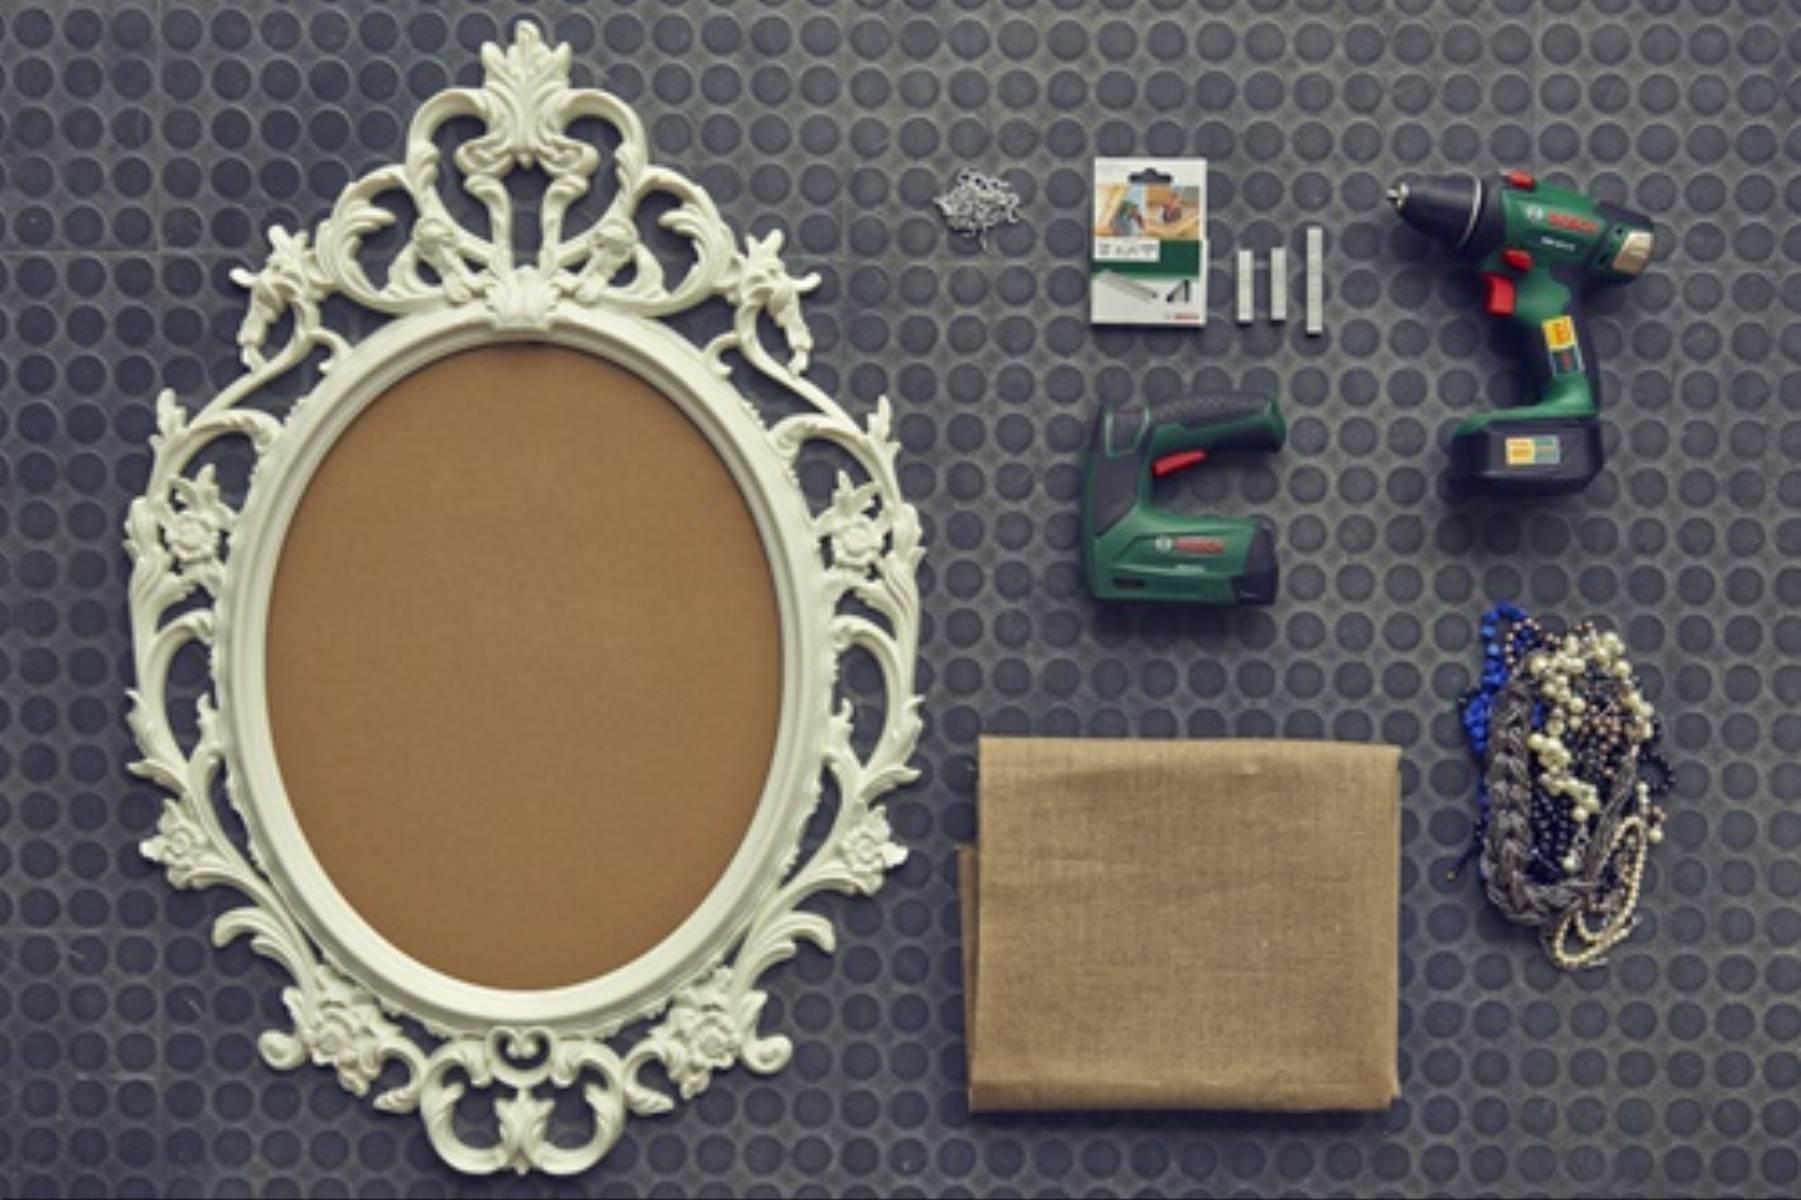 Fot. Bosch_Rama na biżuterię_lista materiałów